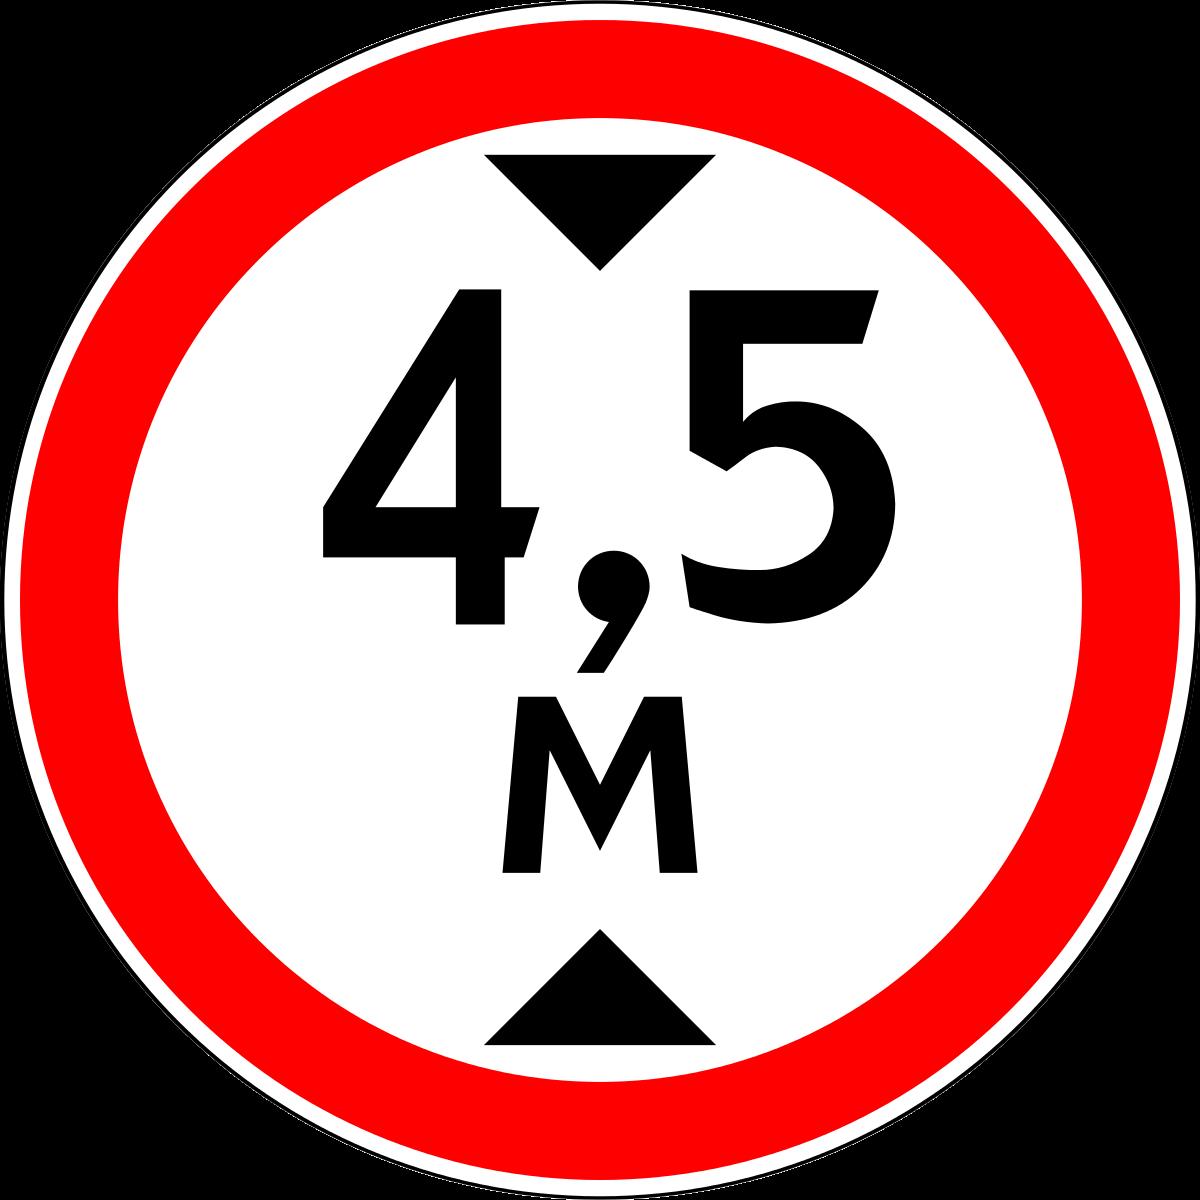 Знак 3.13 Биіктікті шектеу/ Ограничение высоты